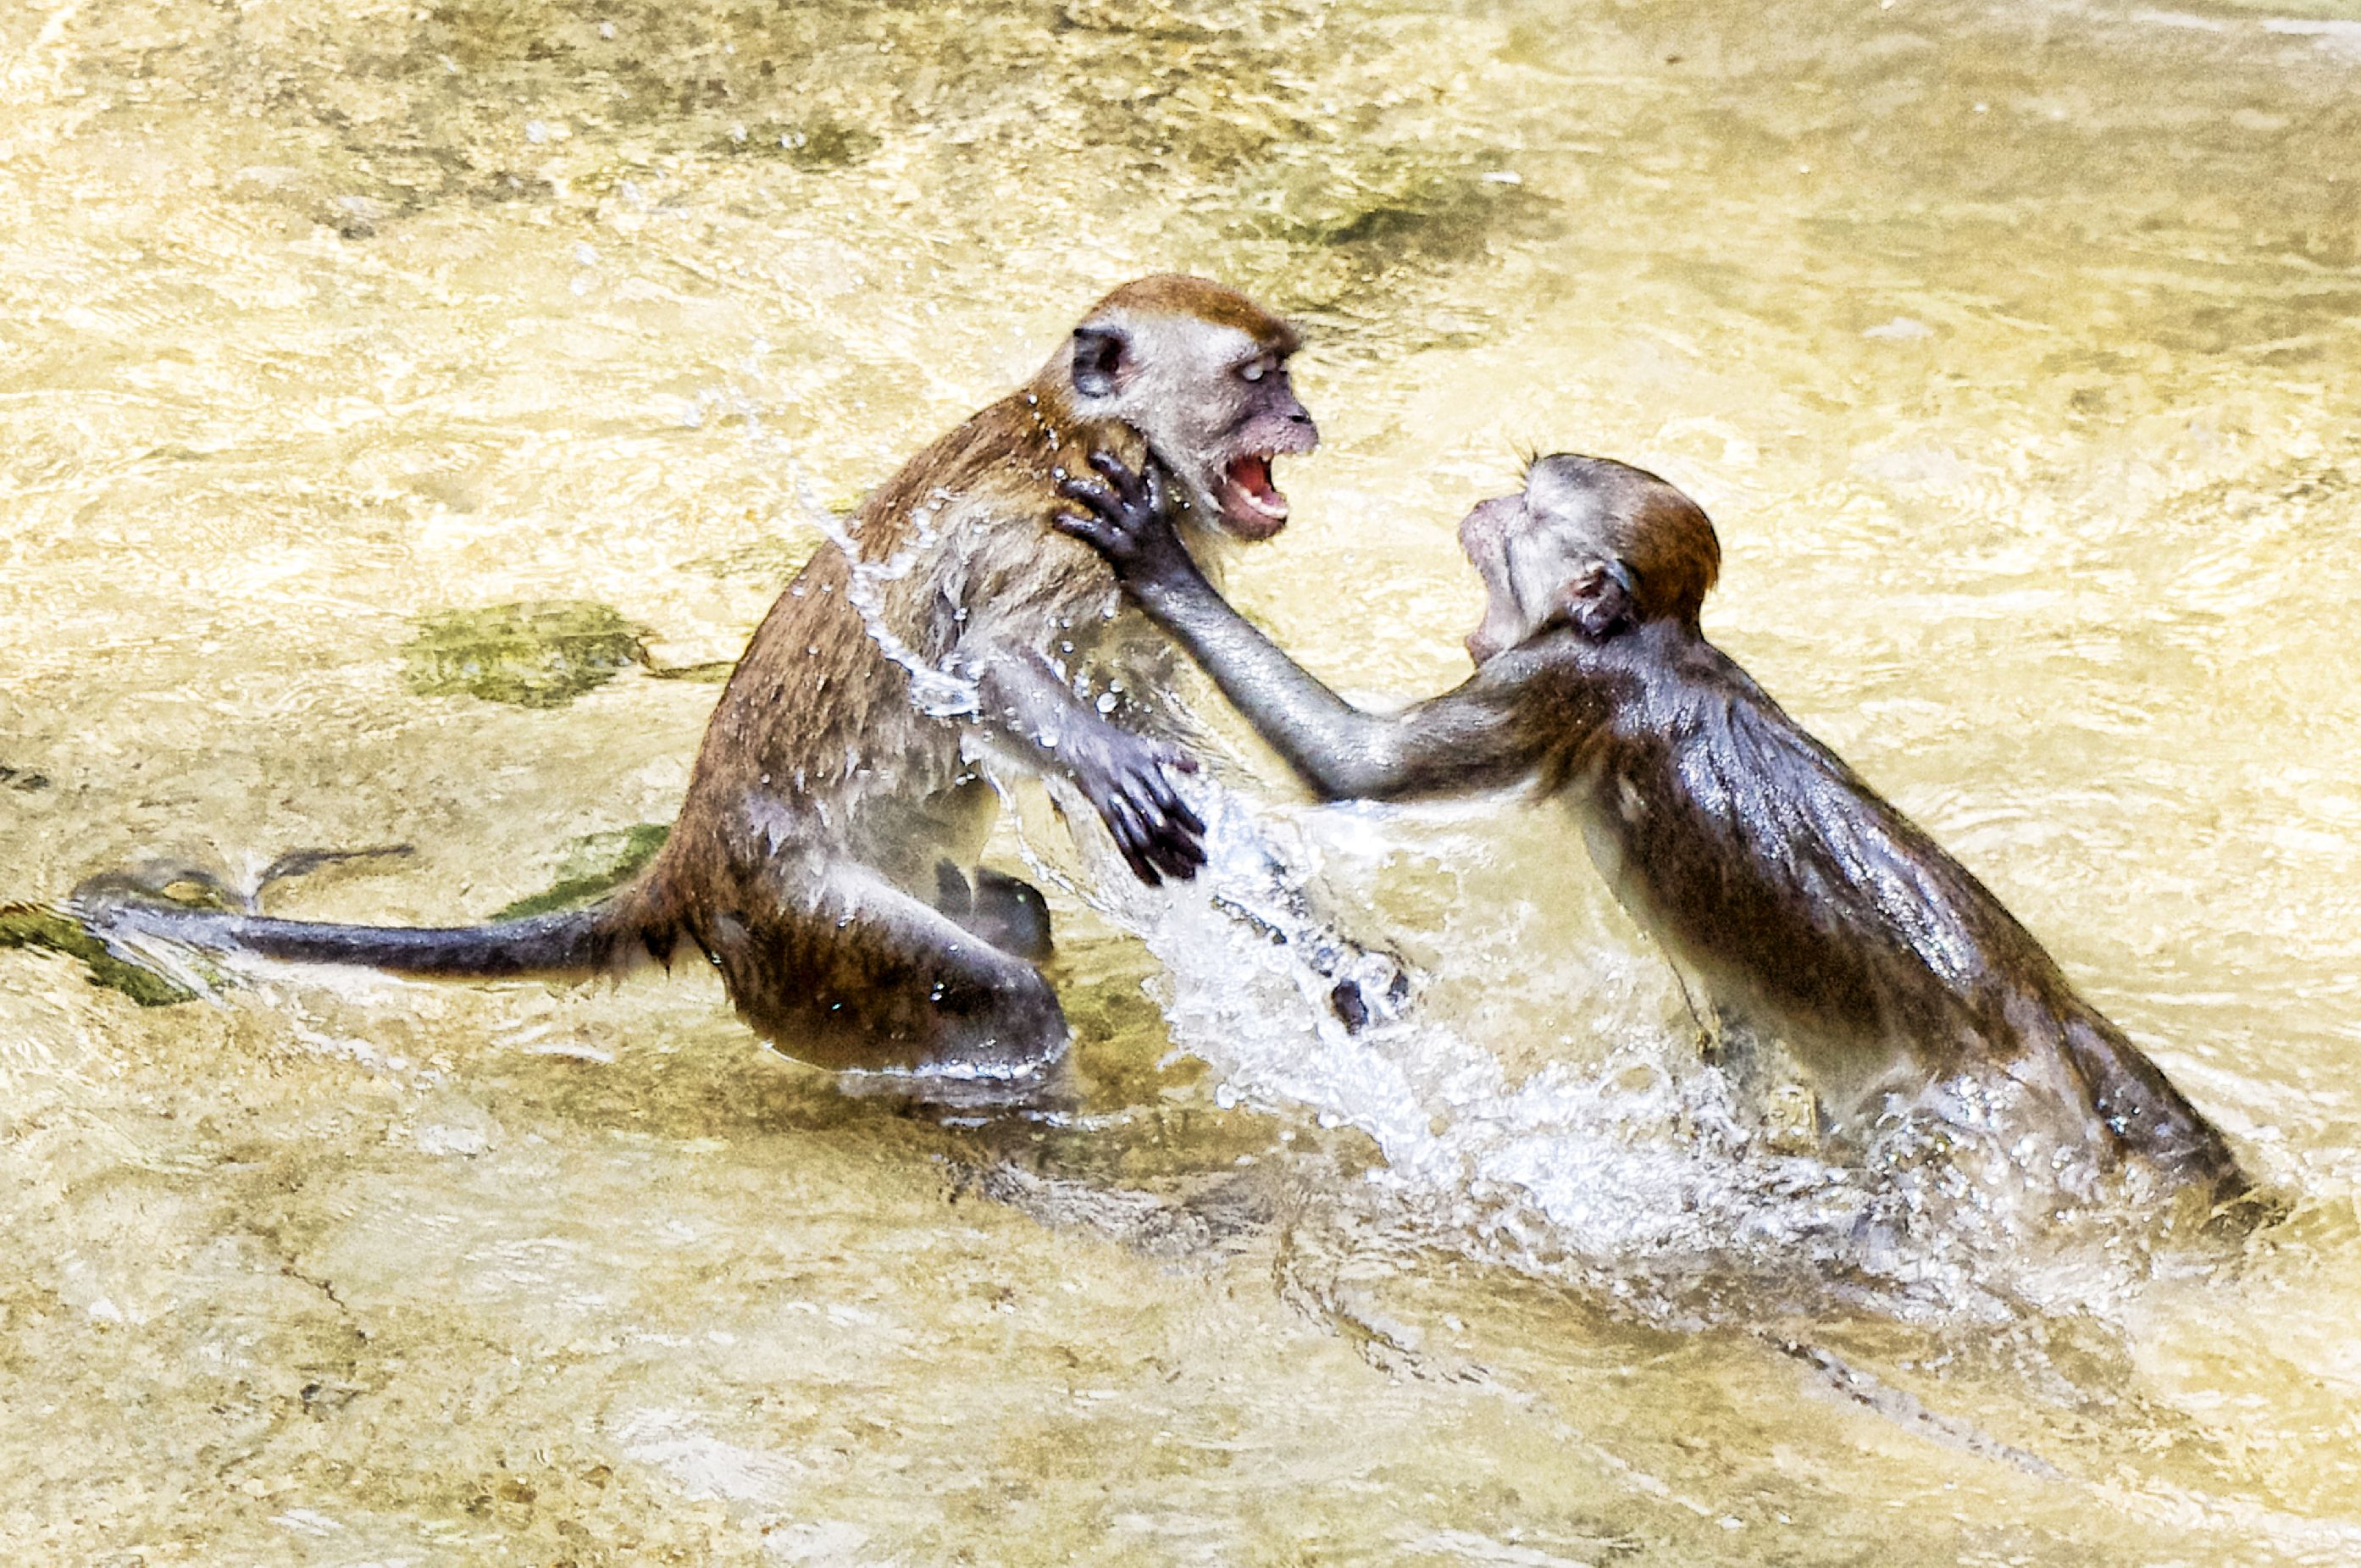 wild monkeys fighting ashton morris